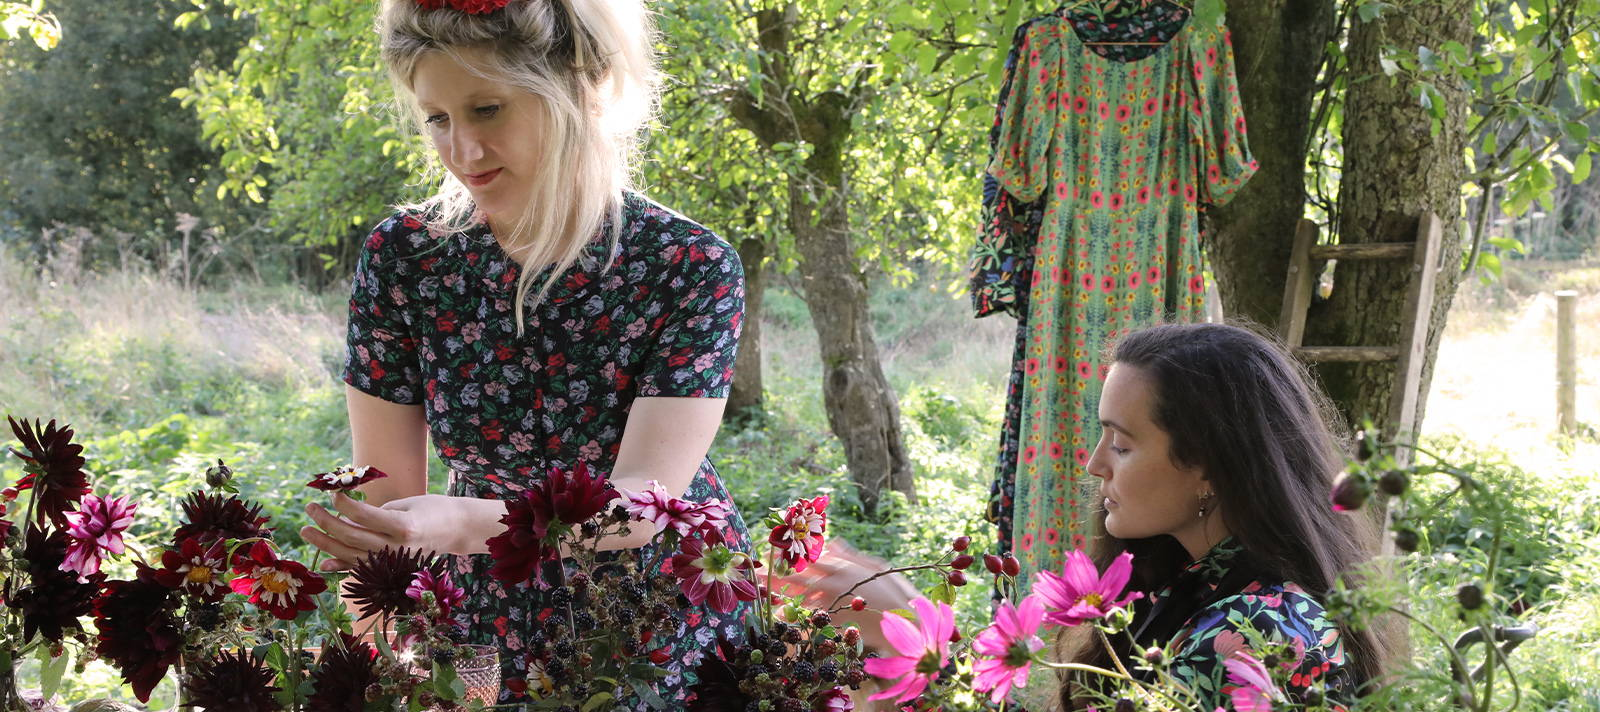 Kitten Grayson and Harriette Tebbutt wearing YOLKE and arranging flowers